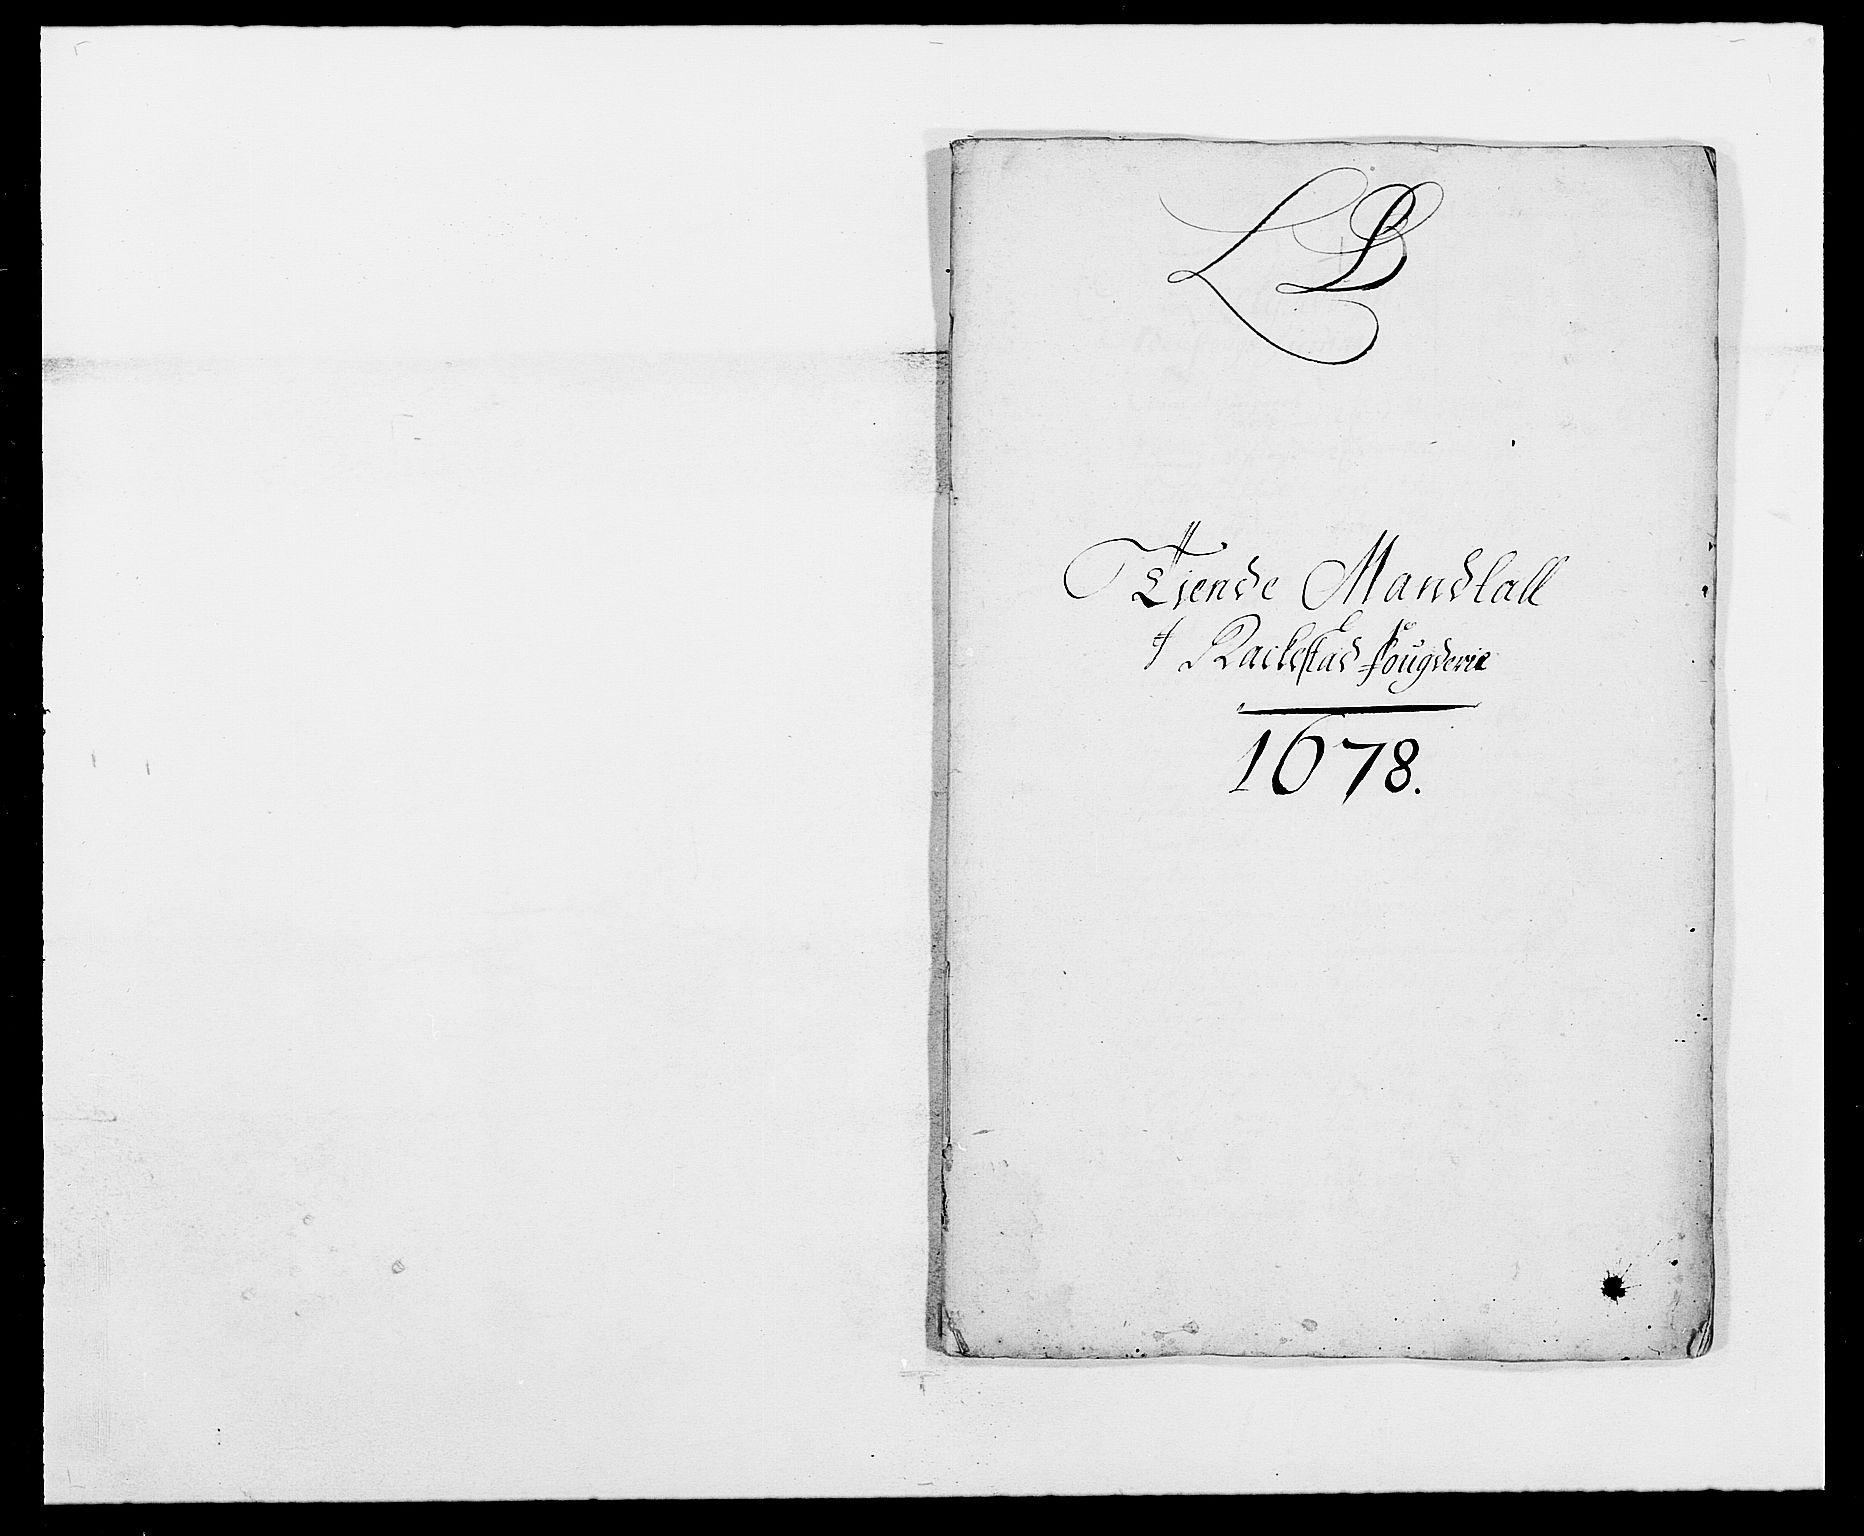 RA, Rentekammeret inntil 1814, Reviderte regnskaper, Fogderegnskap, R05/L0271: Fogderegnskap Rakkestad, 1678-1679, s. 38